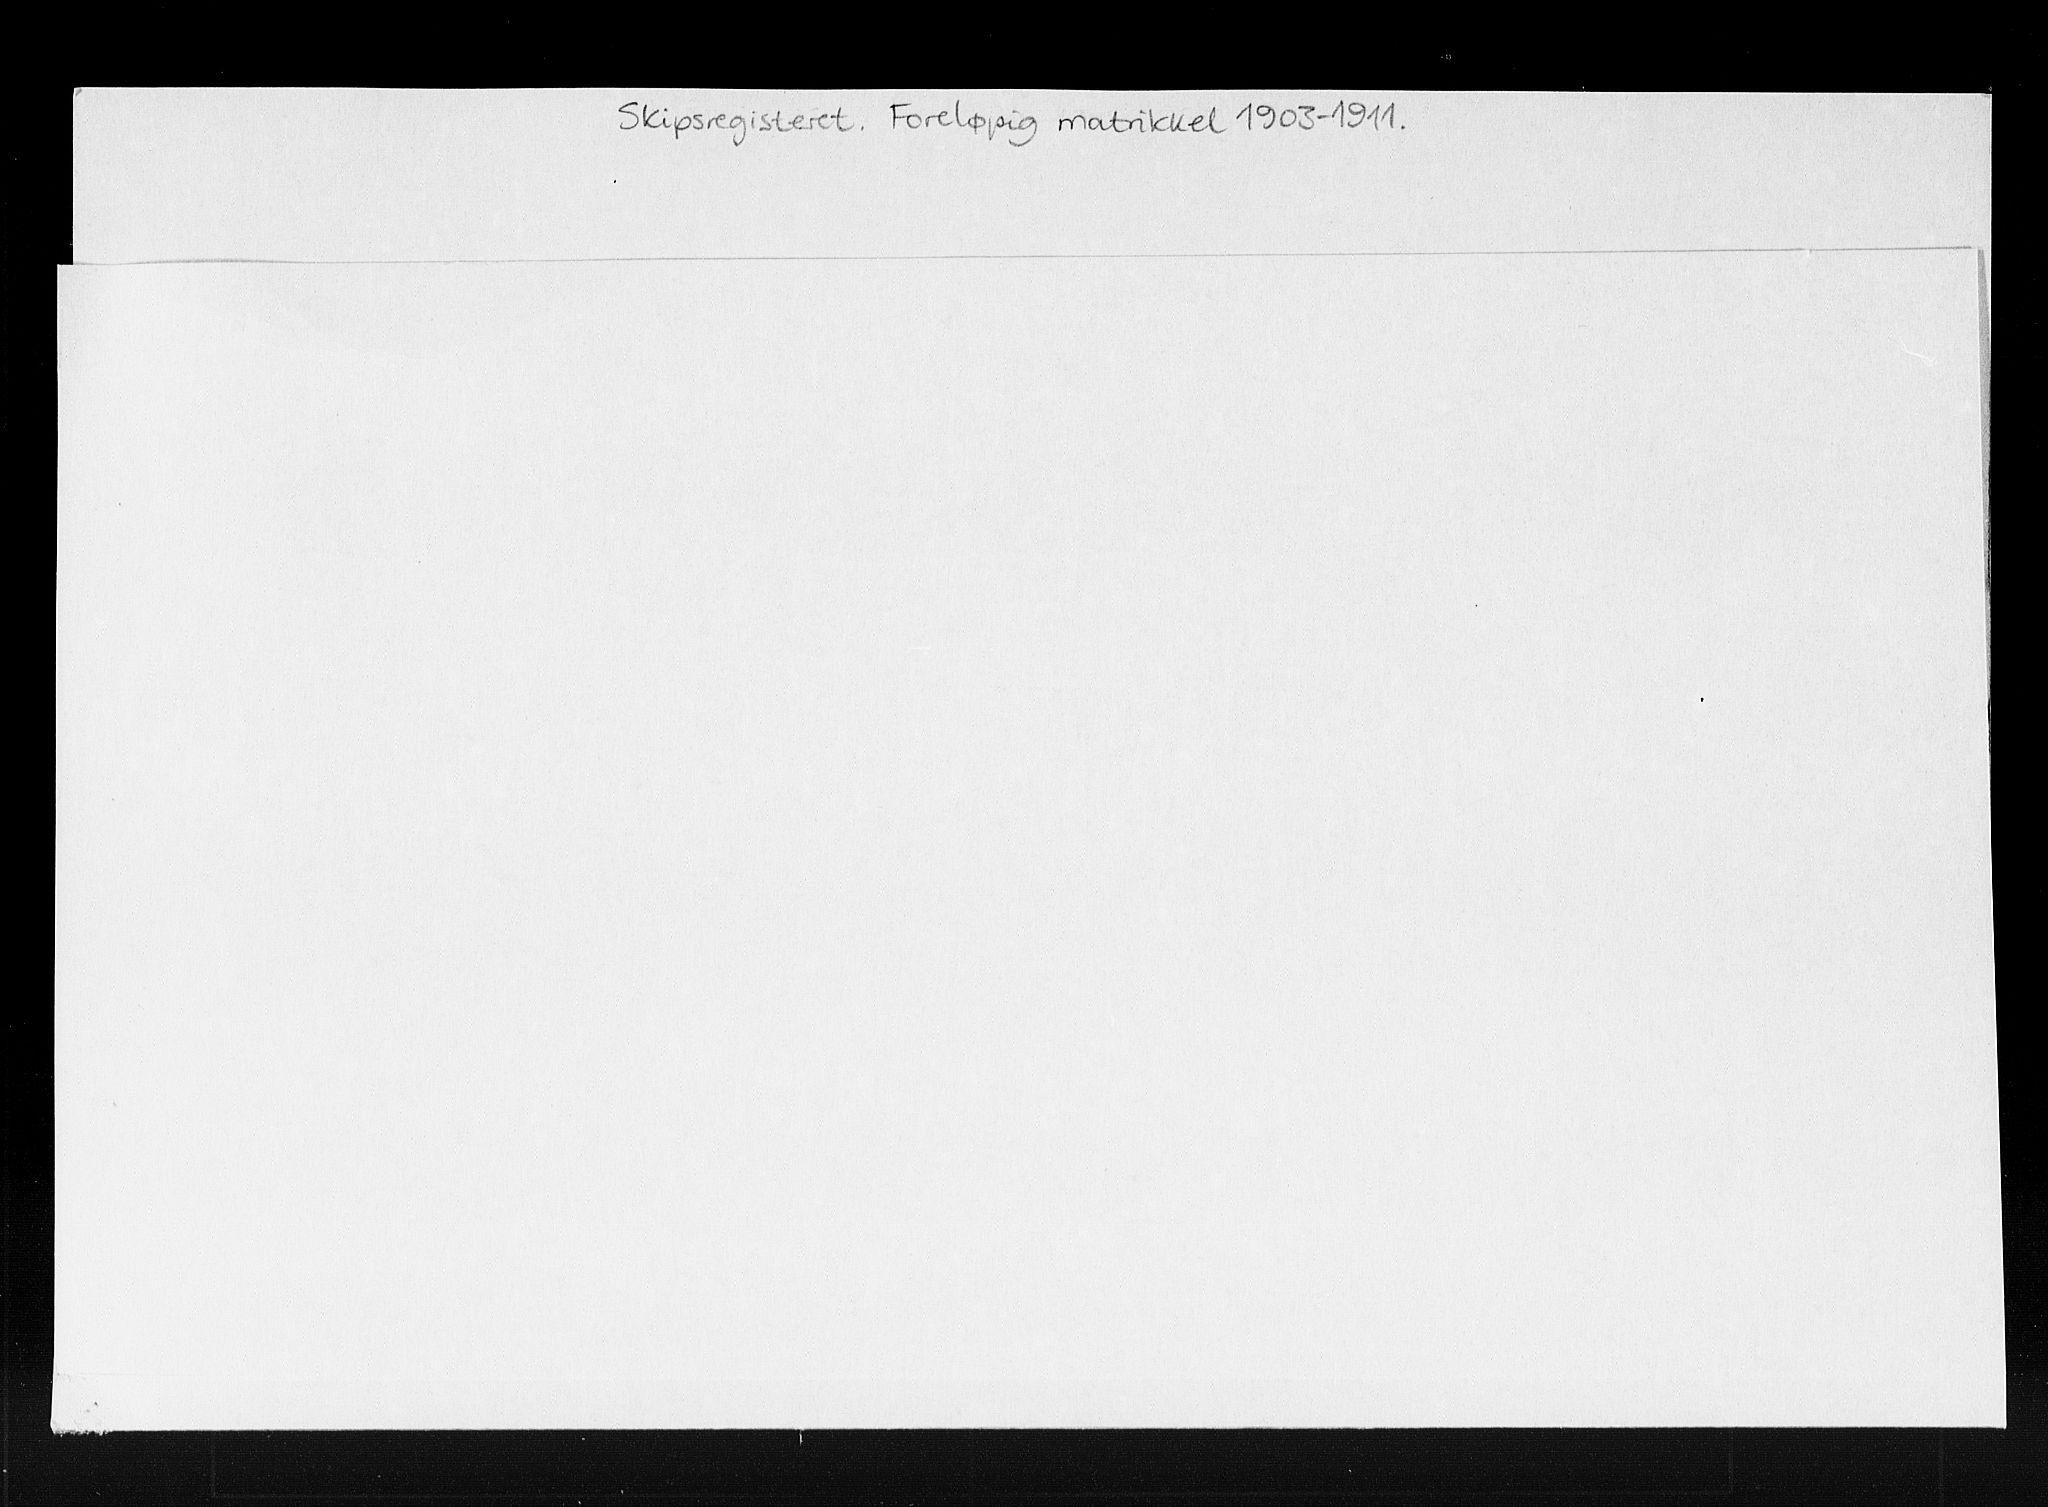 SAK, Lillesand tollsted, H/Ha/L0433: Skipsregister, skipsmatrikkel, 1861-1969, s. 2